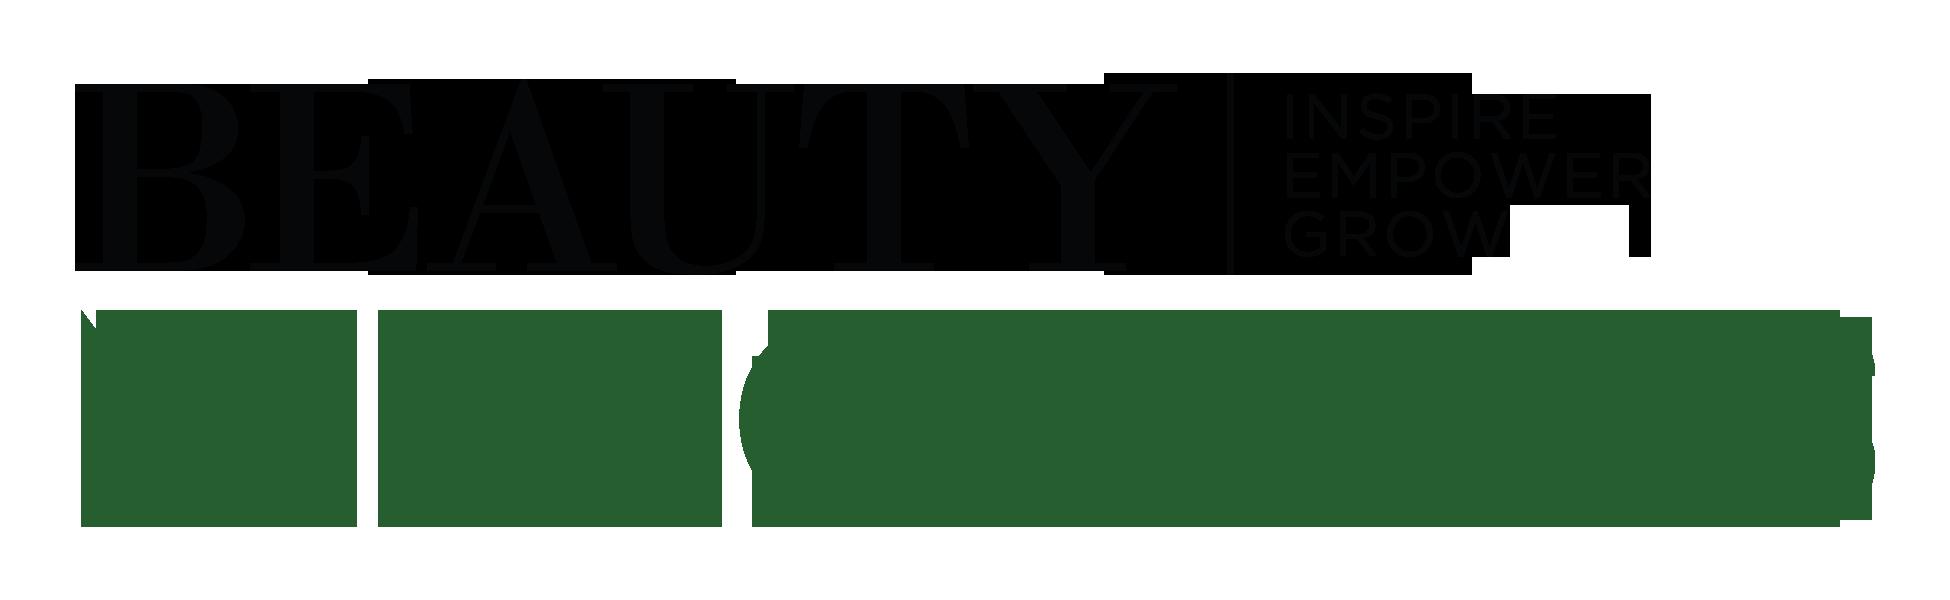 beautymillionaires-logo-green-.png